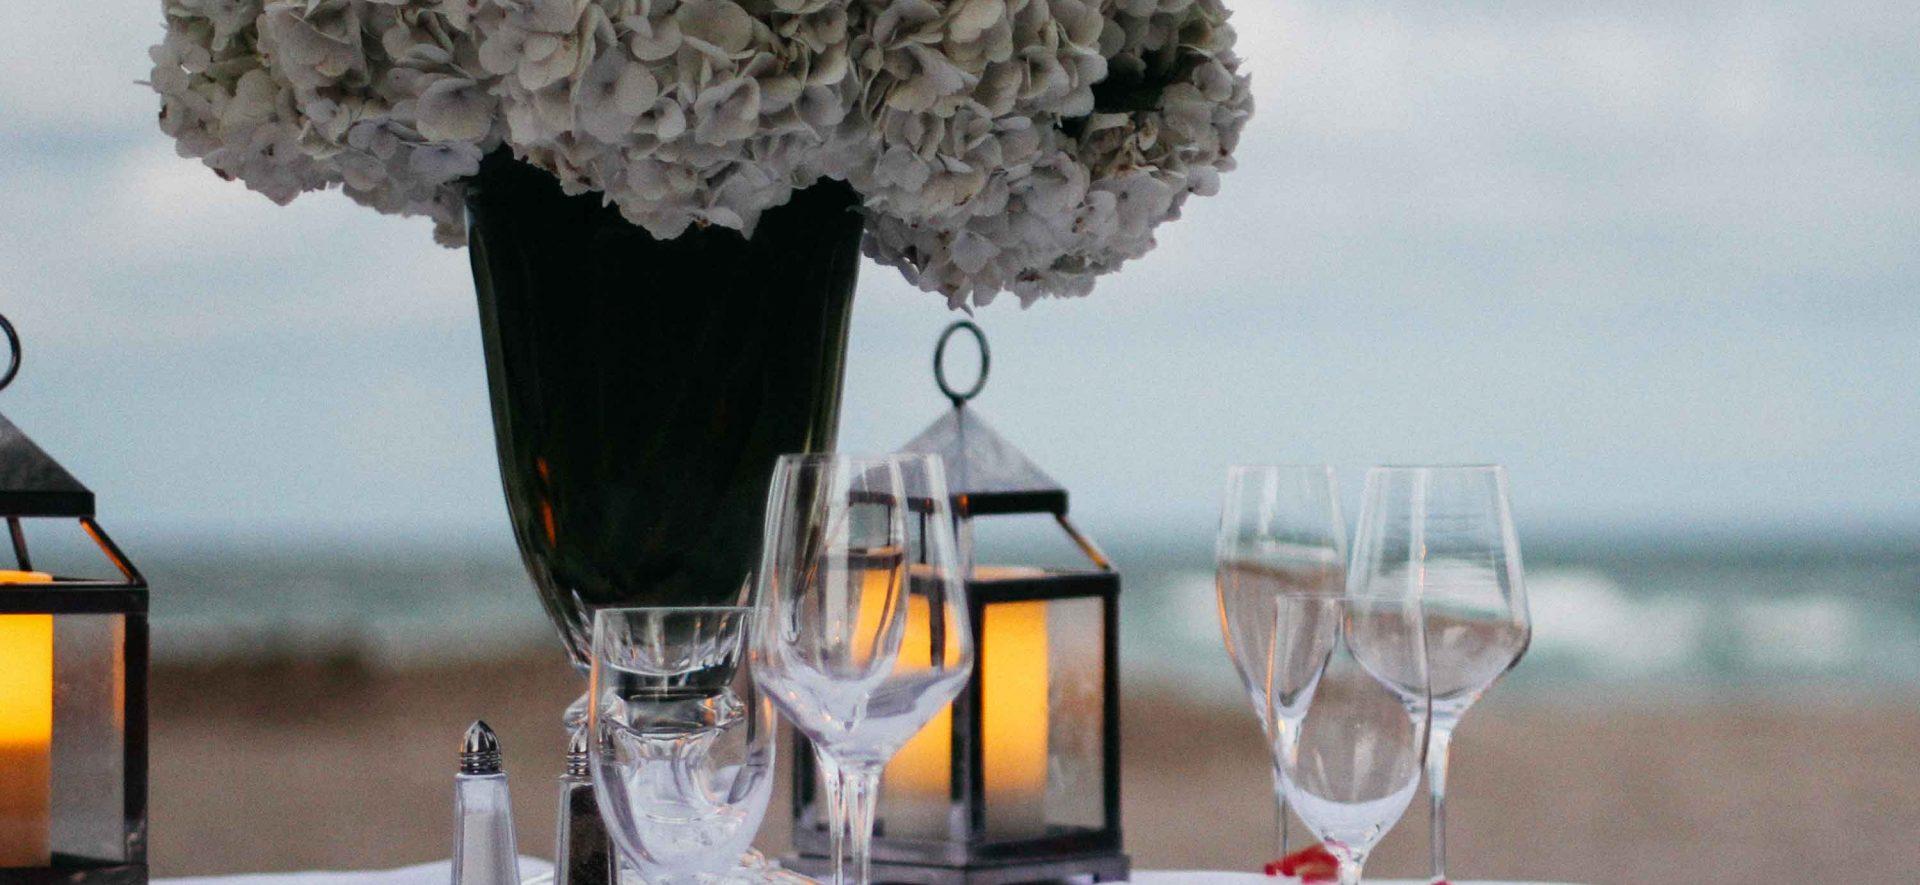 Intimate beachfront dinner at Acqualina Resort & Residences in Miami, Florida